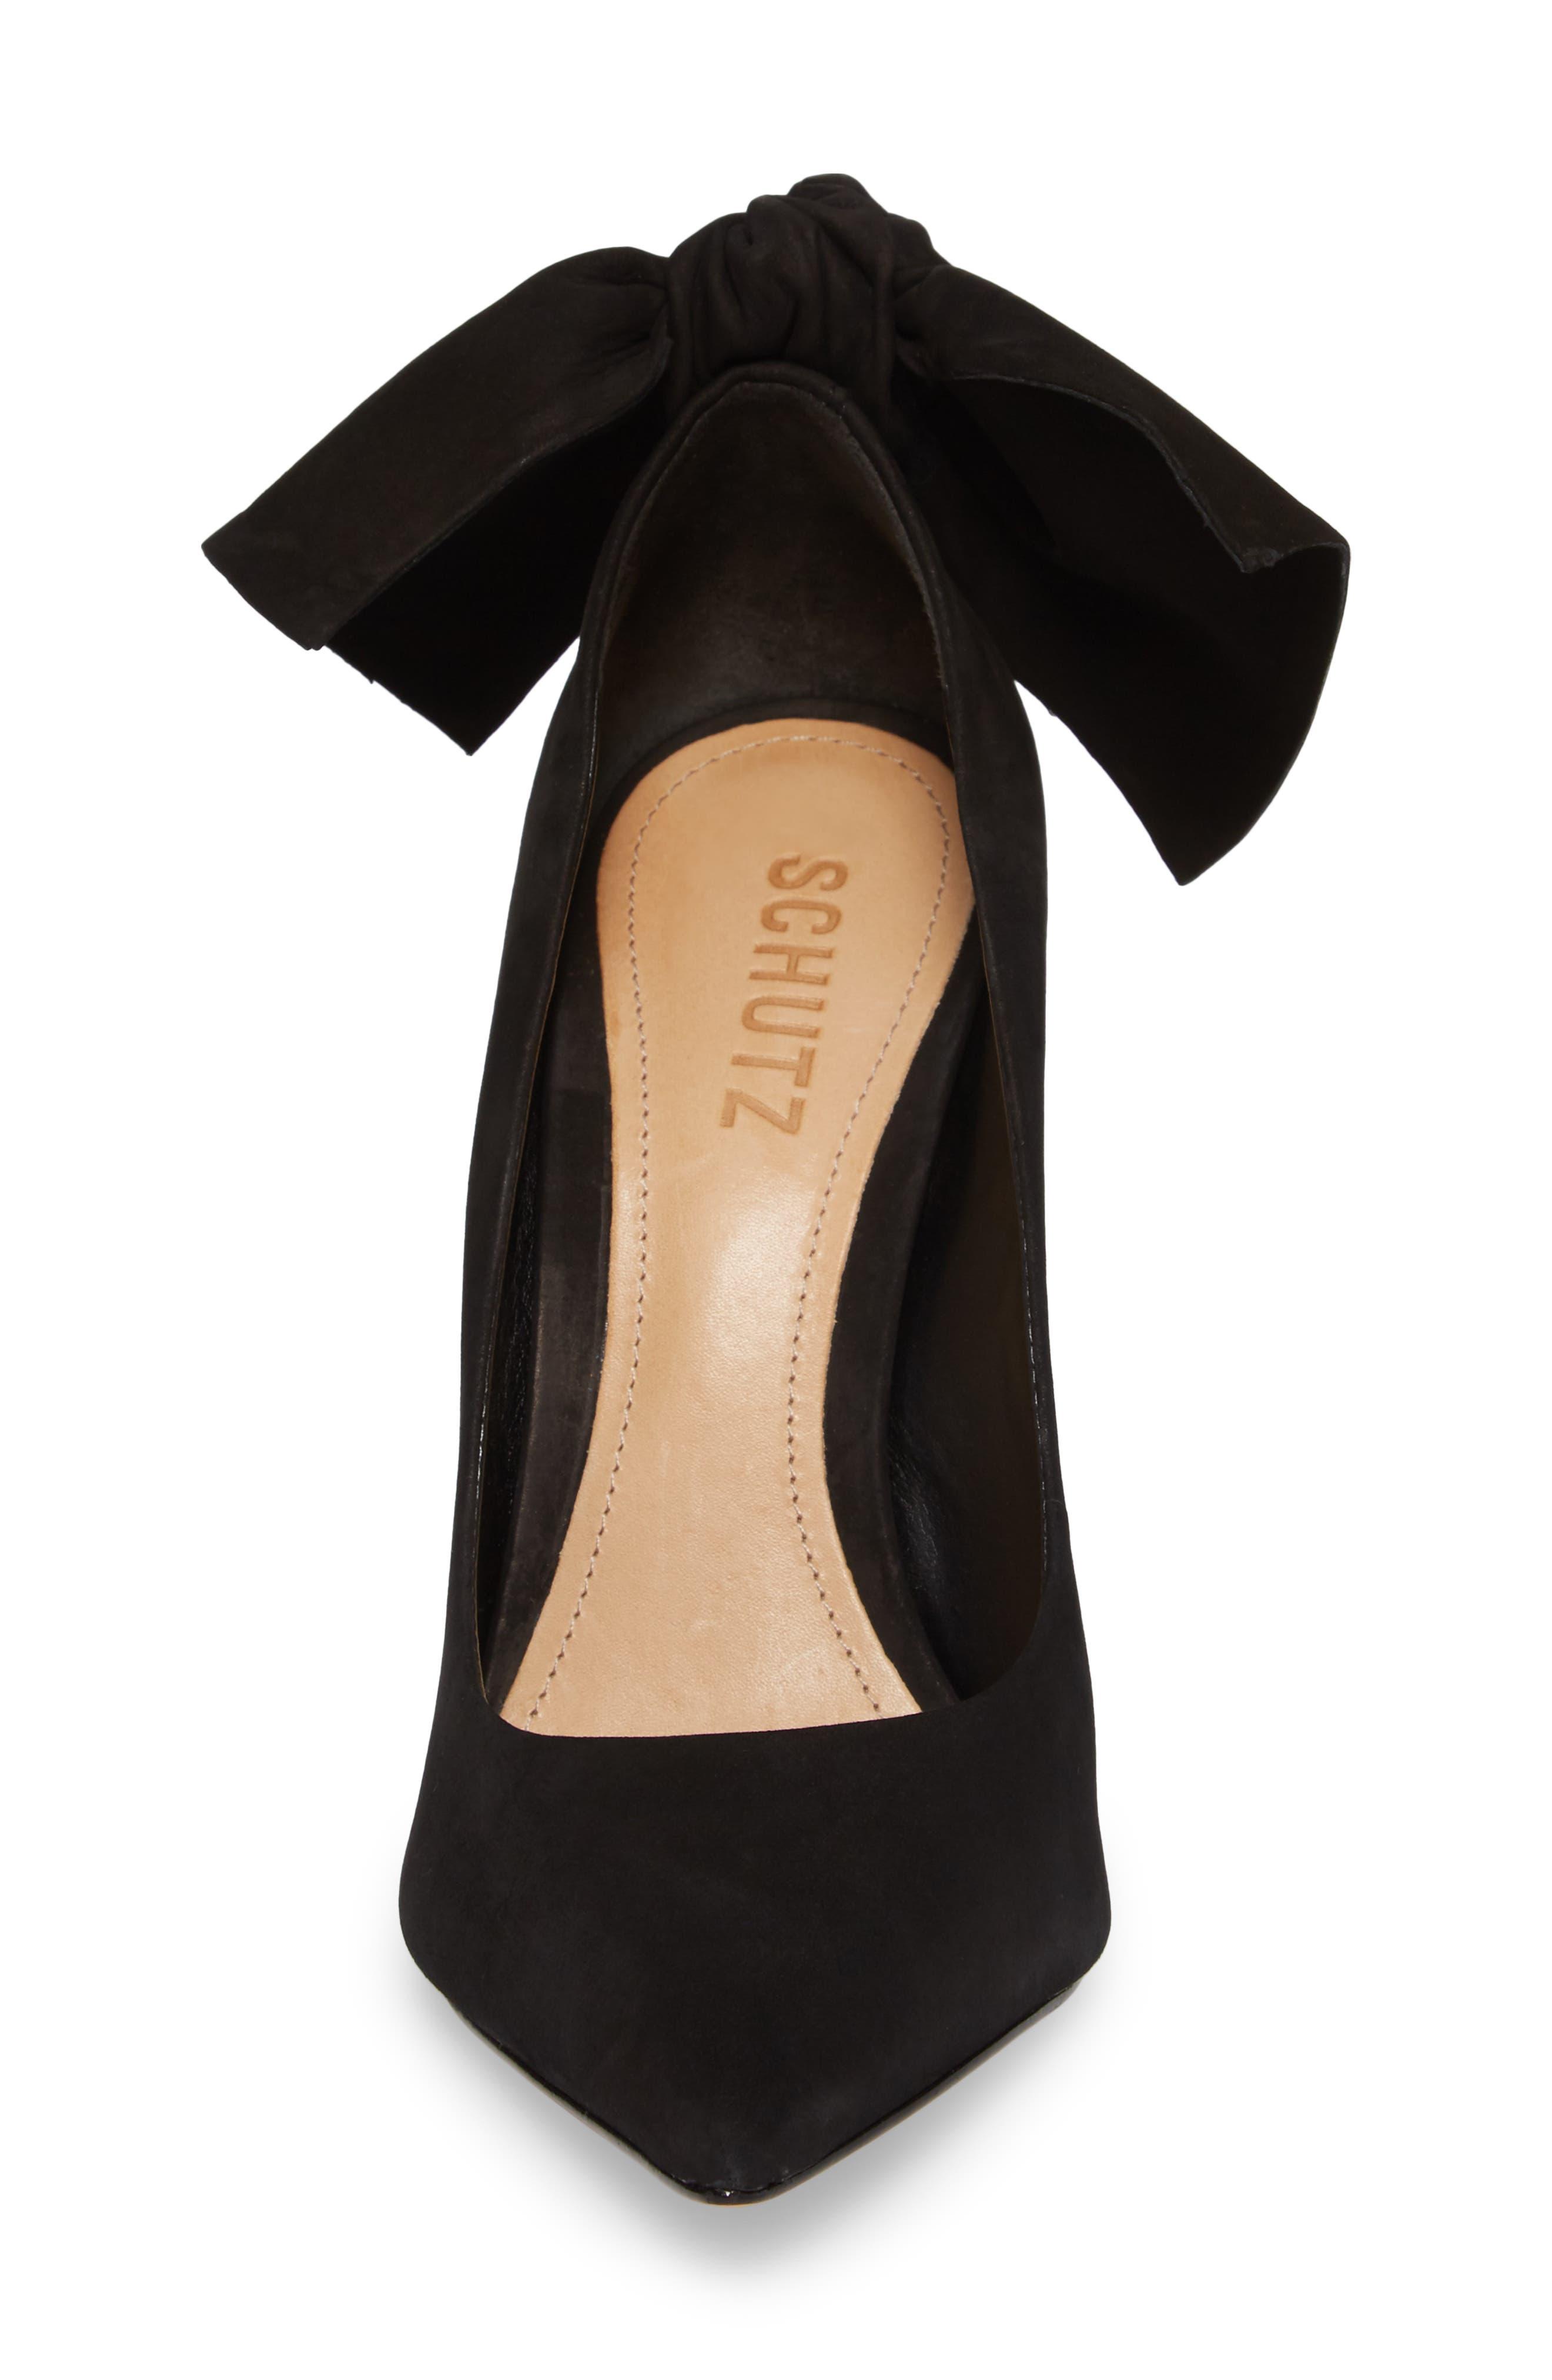 Blasiana Bow Pump,                             Alternate thumbnail 4, color,                             Black Nubuck Leather